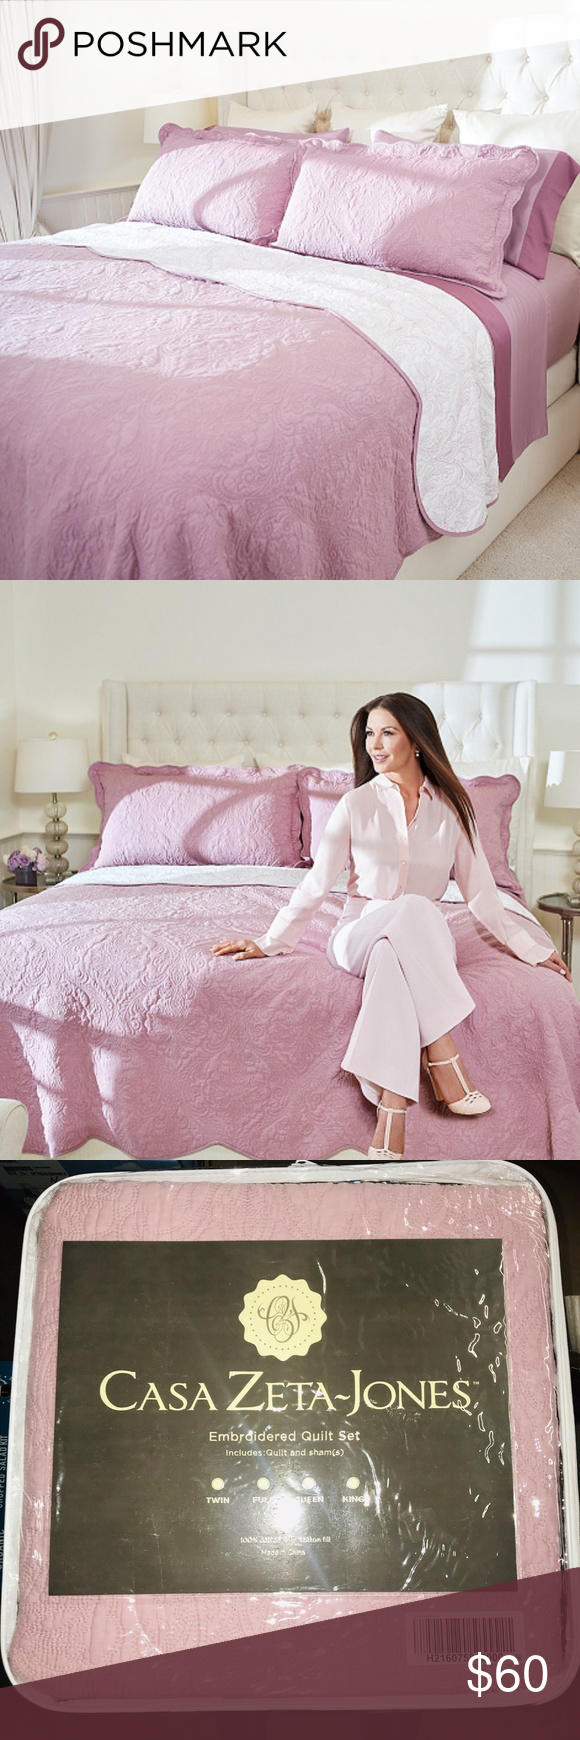 "Casa Zeta-Jones Matelasse Jacquard Bedspread with Shams KING 120/"" x 120/"""